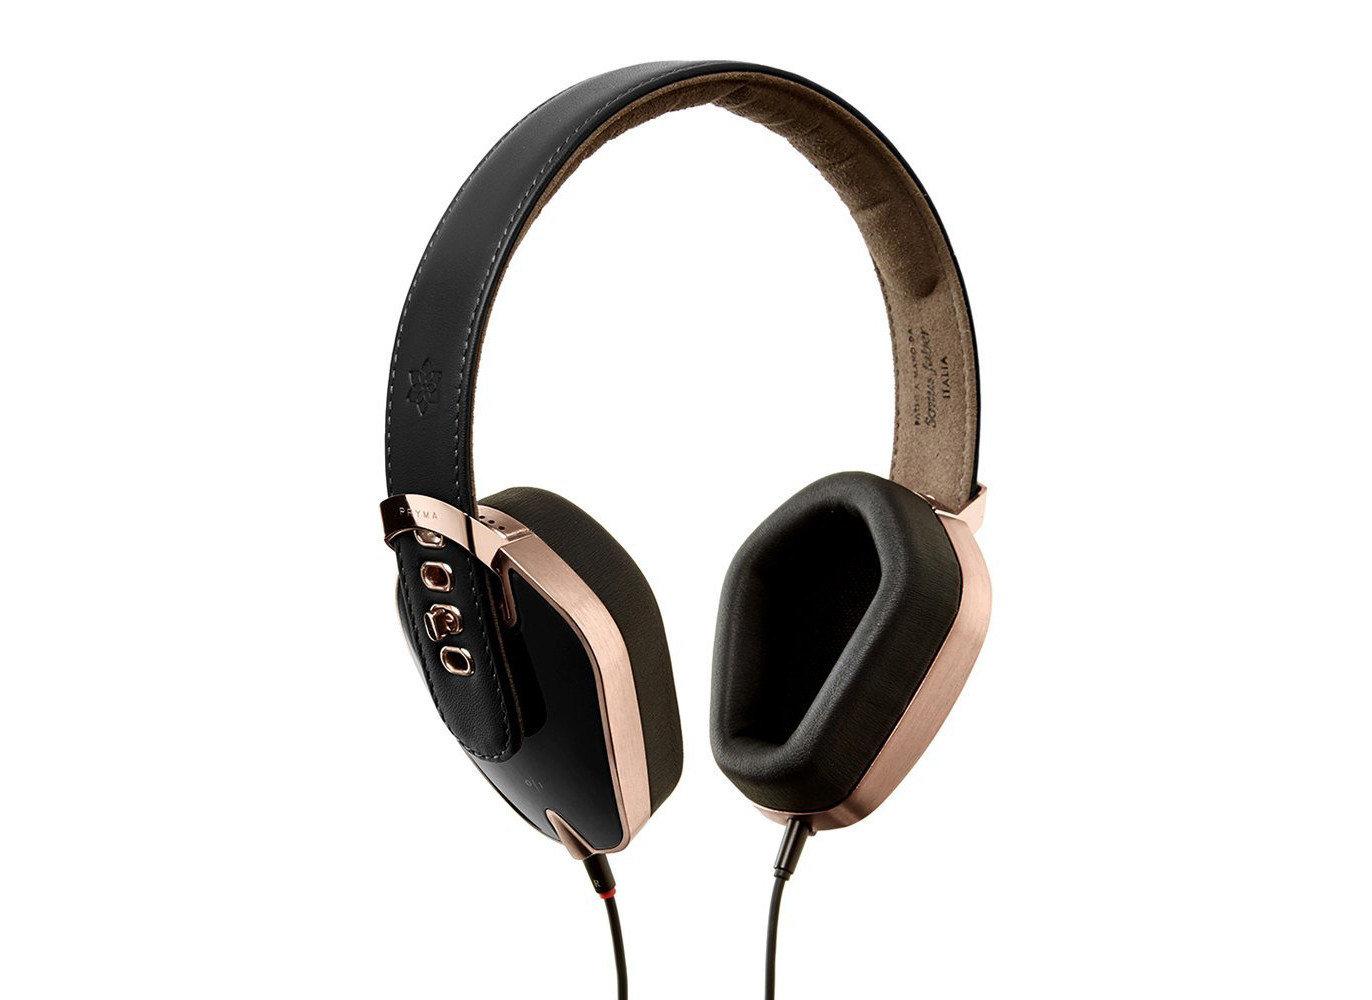 Style + Design electronics headphones earphone audio equipment gadget electronic device technology audio product ear organ communication device headset